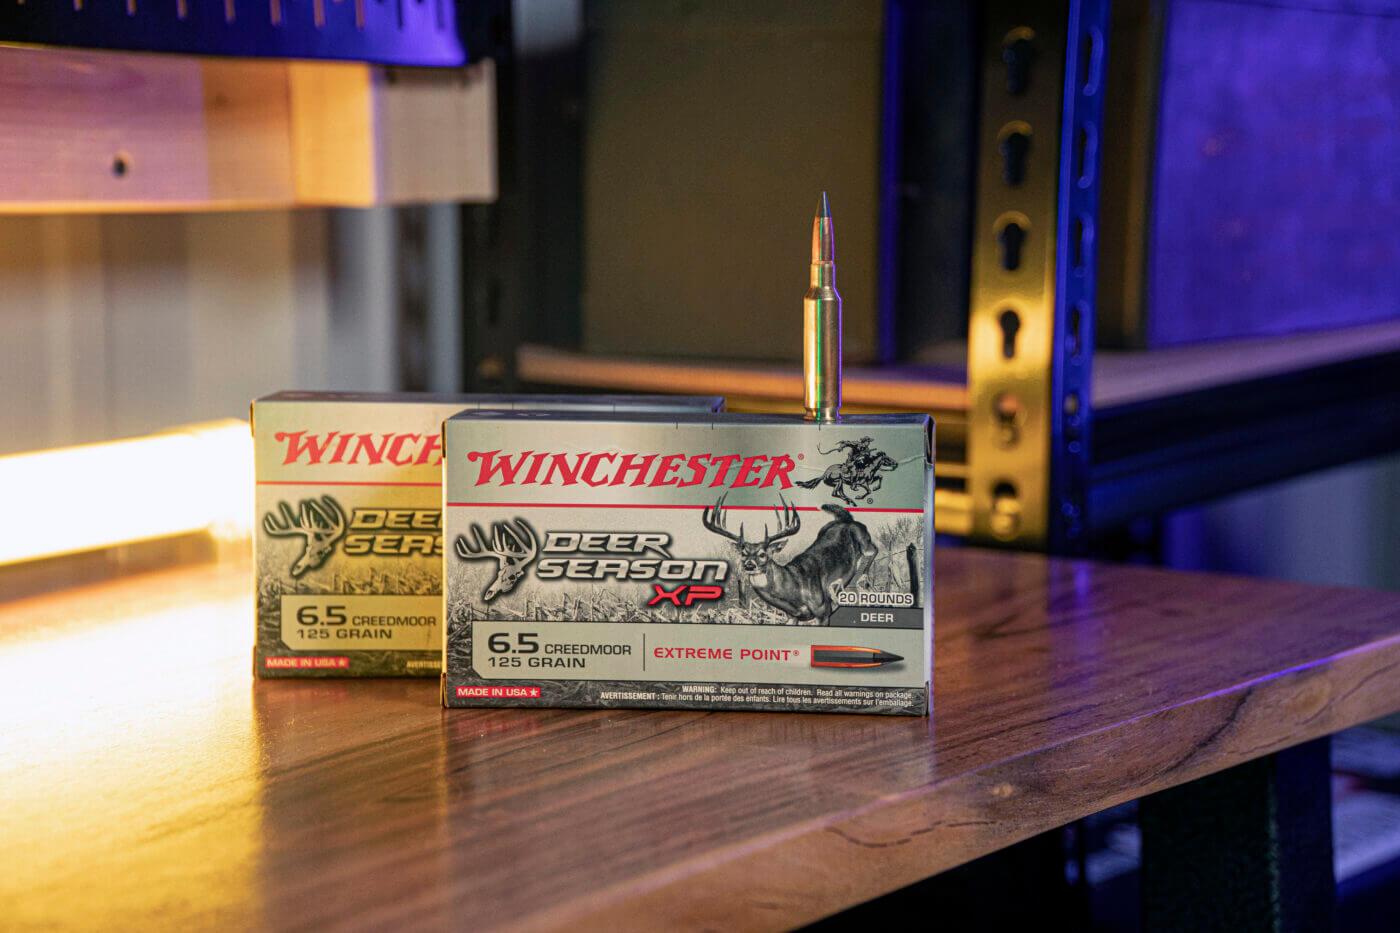 Winchester Deer Season XP ammo in 6.5 Creedmoor